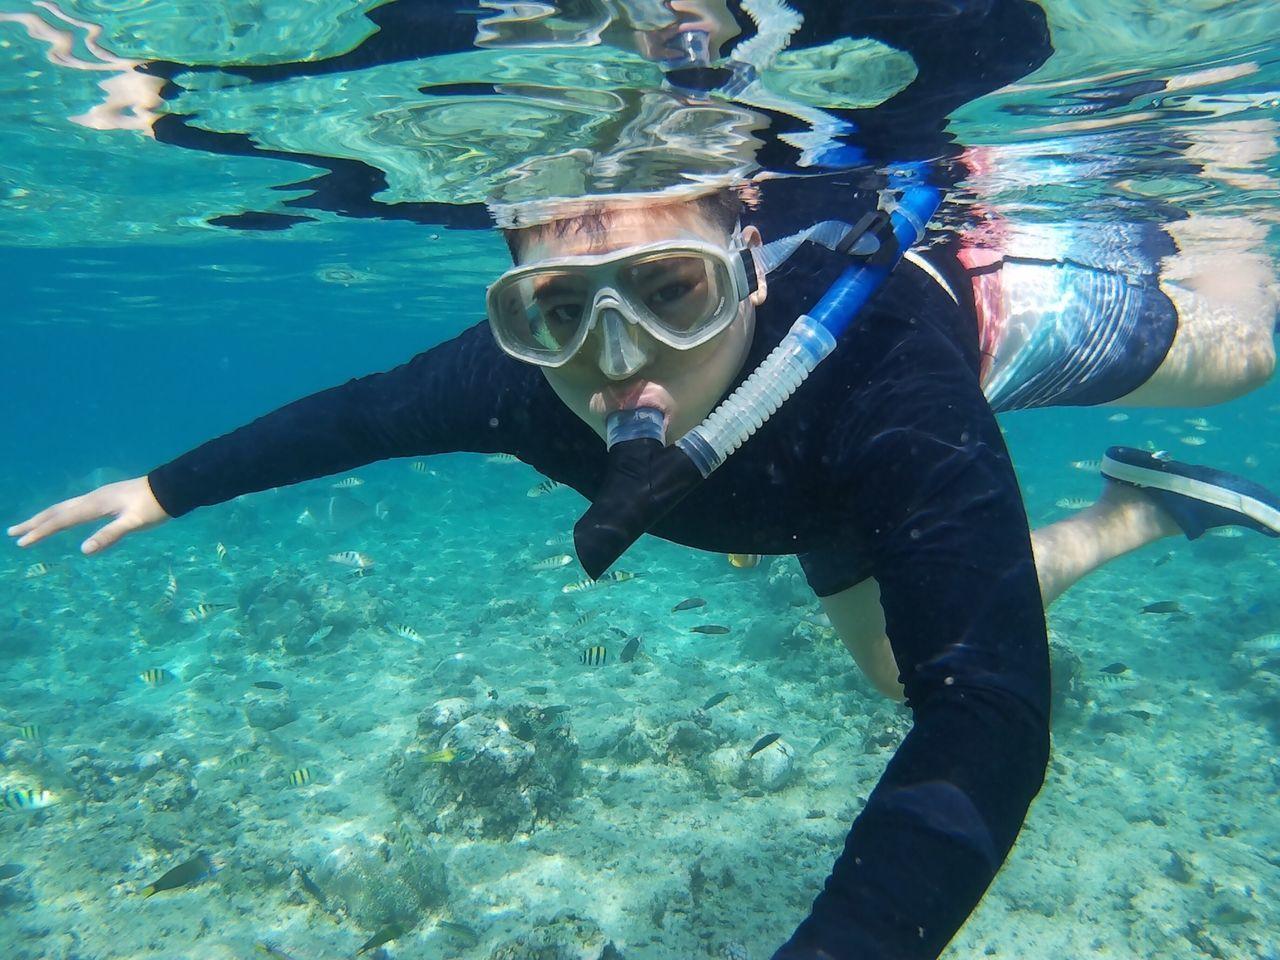 Panglao Crocs Underwater SJCAM Fishes Happiness LivingLife Beautiful Creation Seatour Snorkling